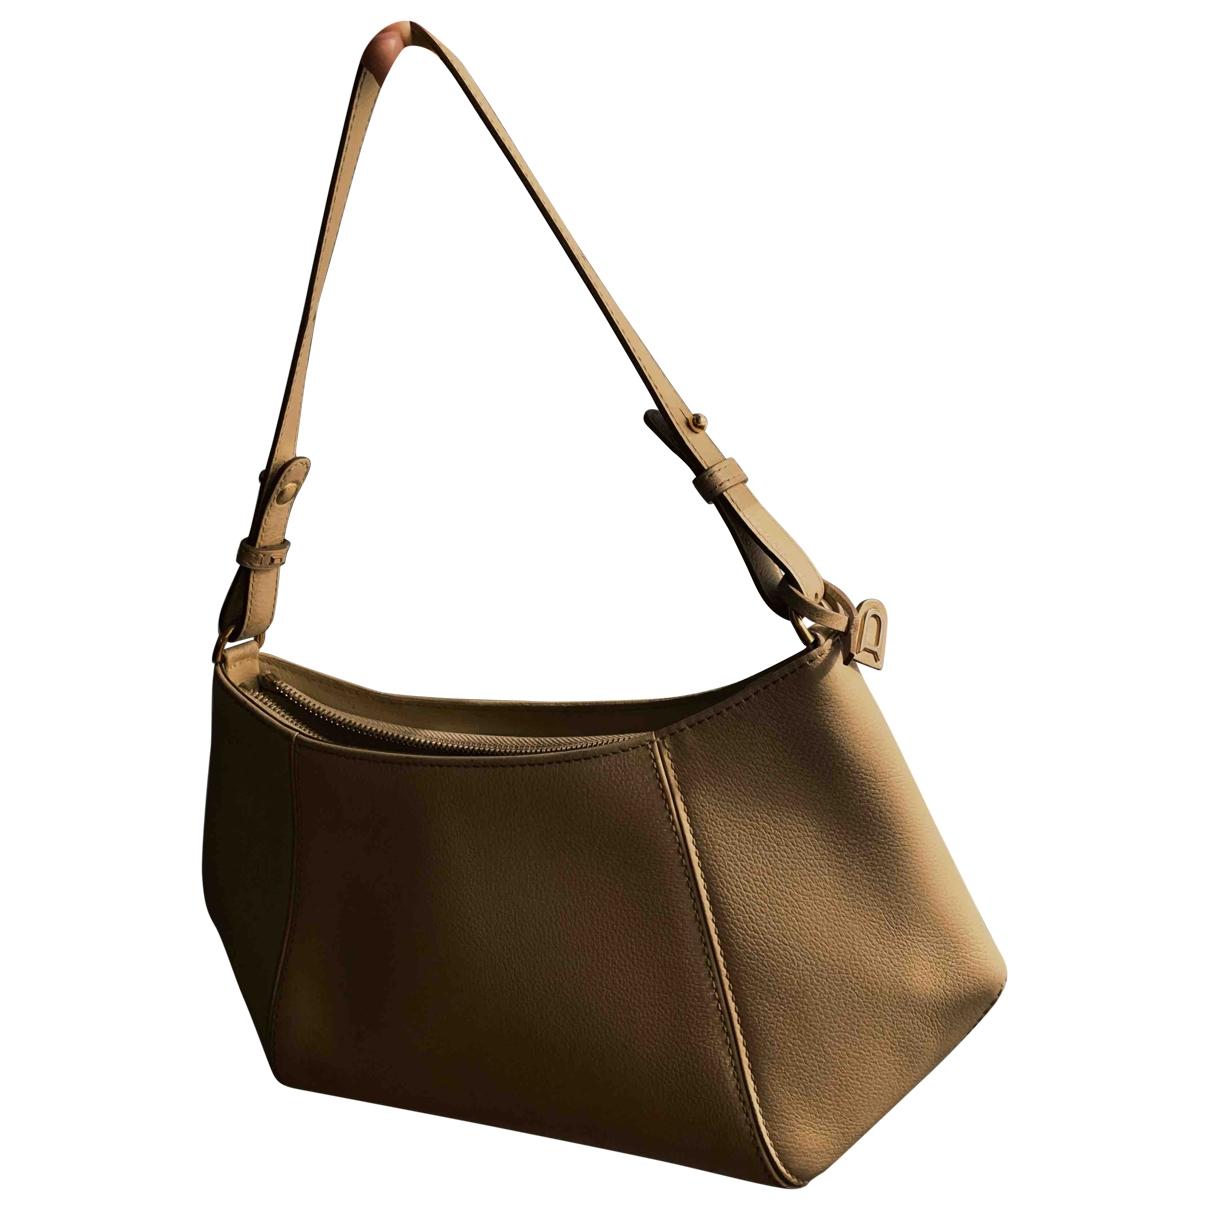 Delvaux \N Beige Leather handbag for Women \N